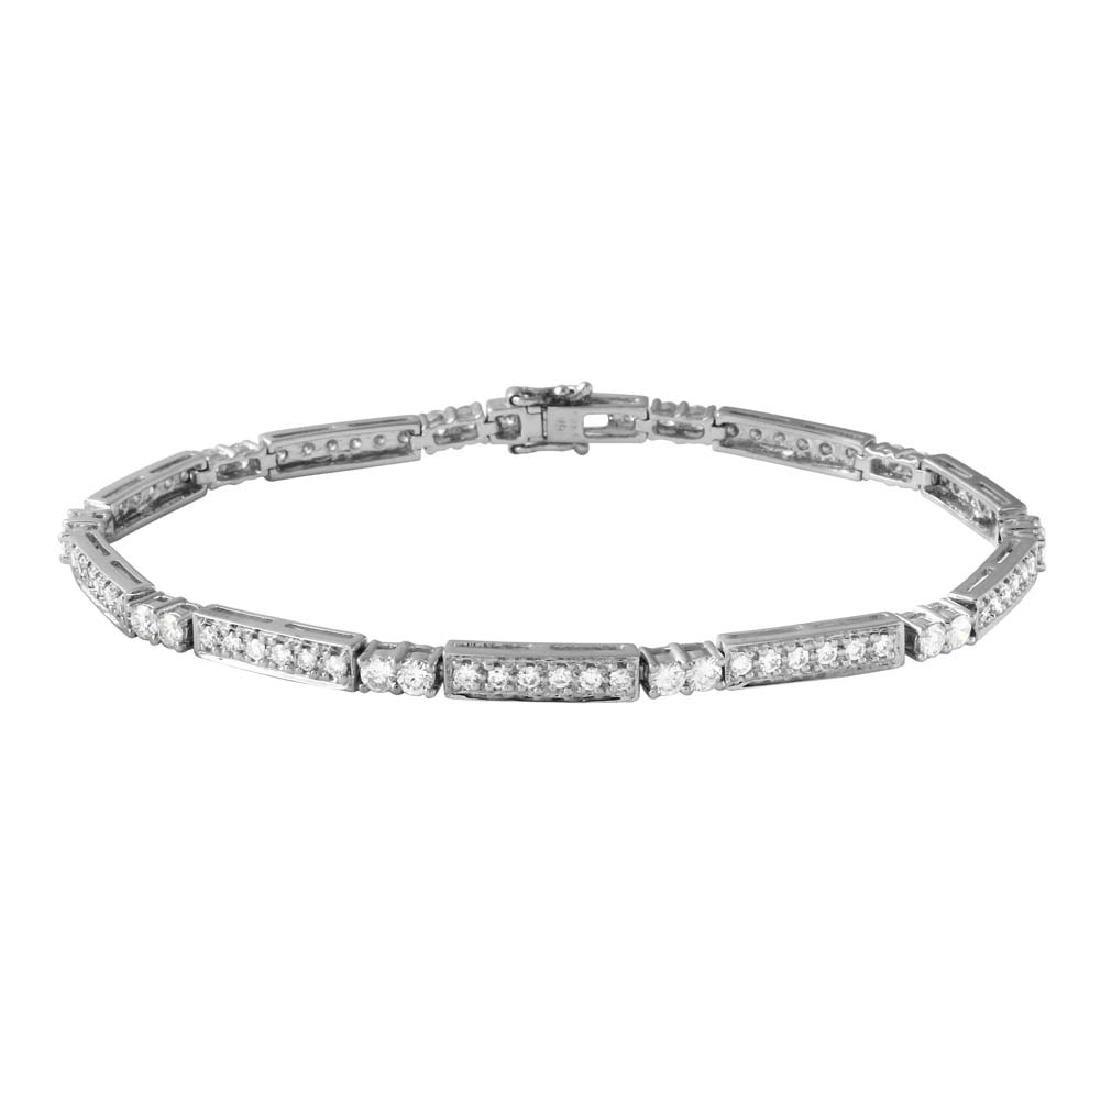 Genuine 2.13 TCW 18K White Gold Ladies Bracelet